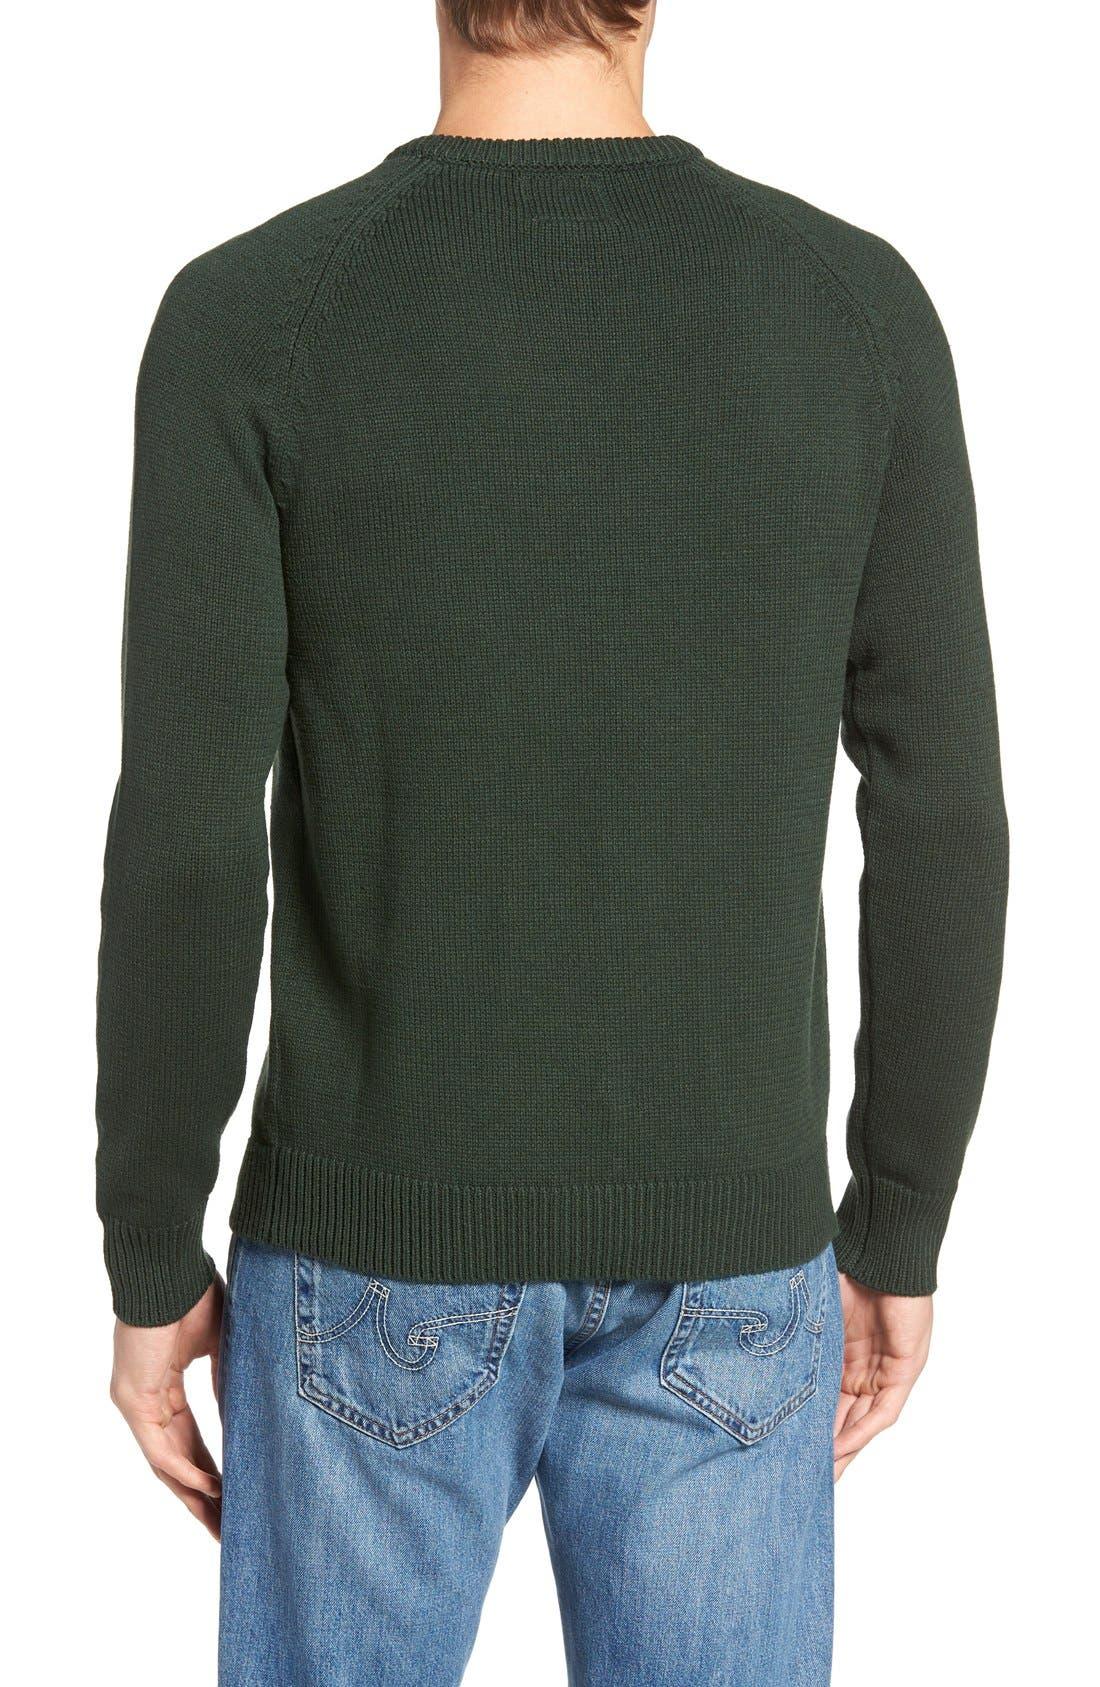 HILLFLINT,                             Michigan State Heritage Sweater,                             Alternate thumbnail 2, color,                             300